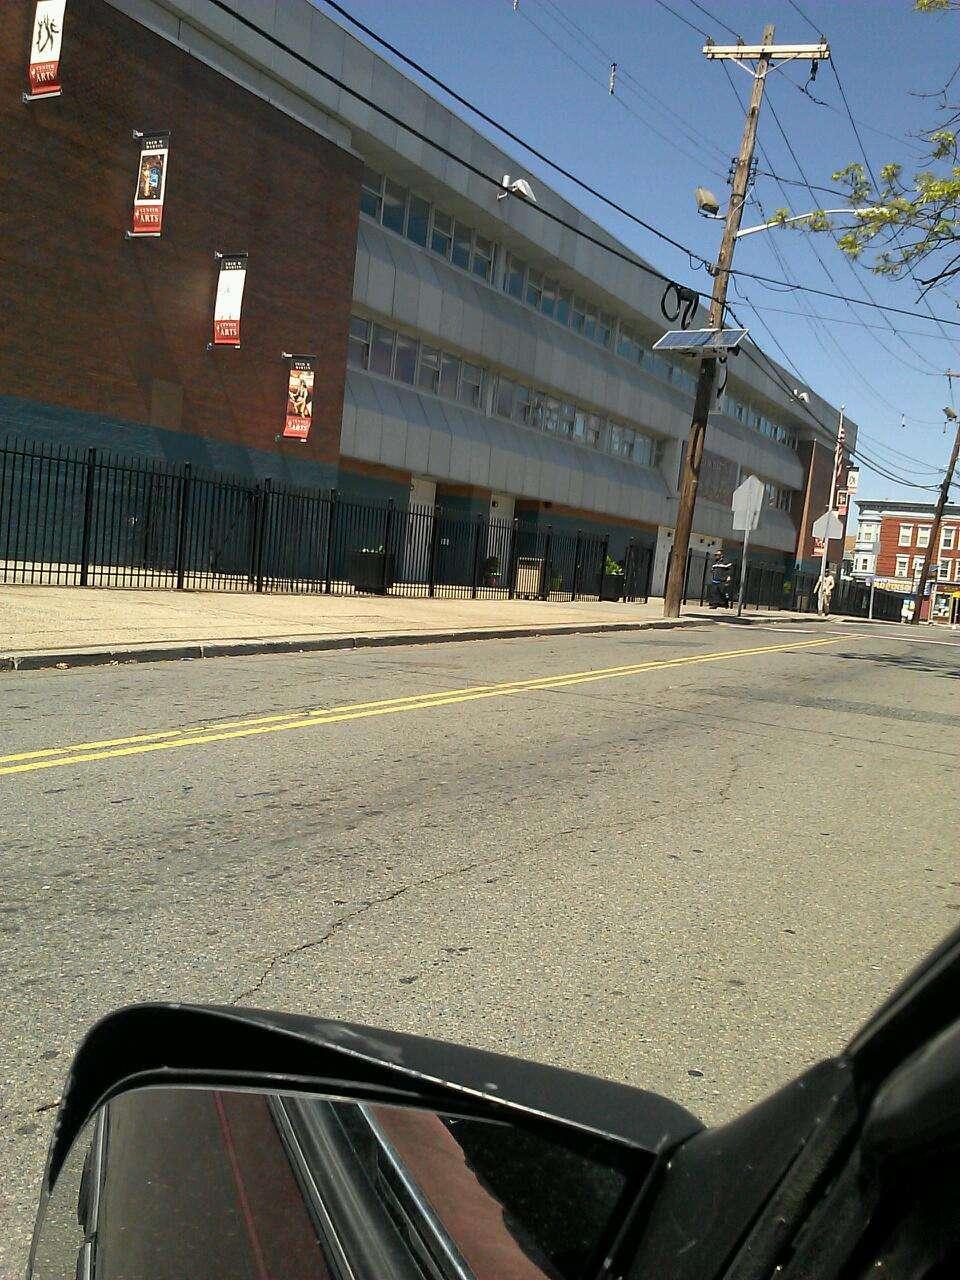 Fred W Martin Center for the Arts Elem School 41 - school  | Photo 1 of 1 | Address: 59 Wilkinson Ave, Jersey City, NJ 07305, USA | Phone: (201) 915-6590